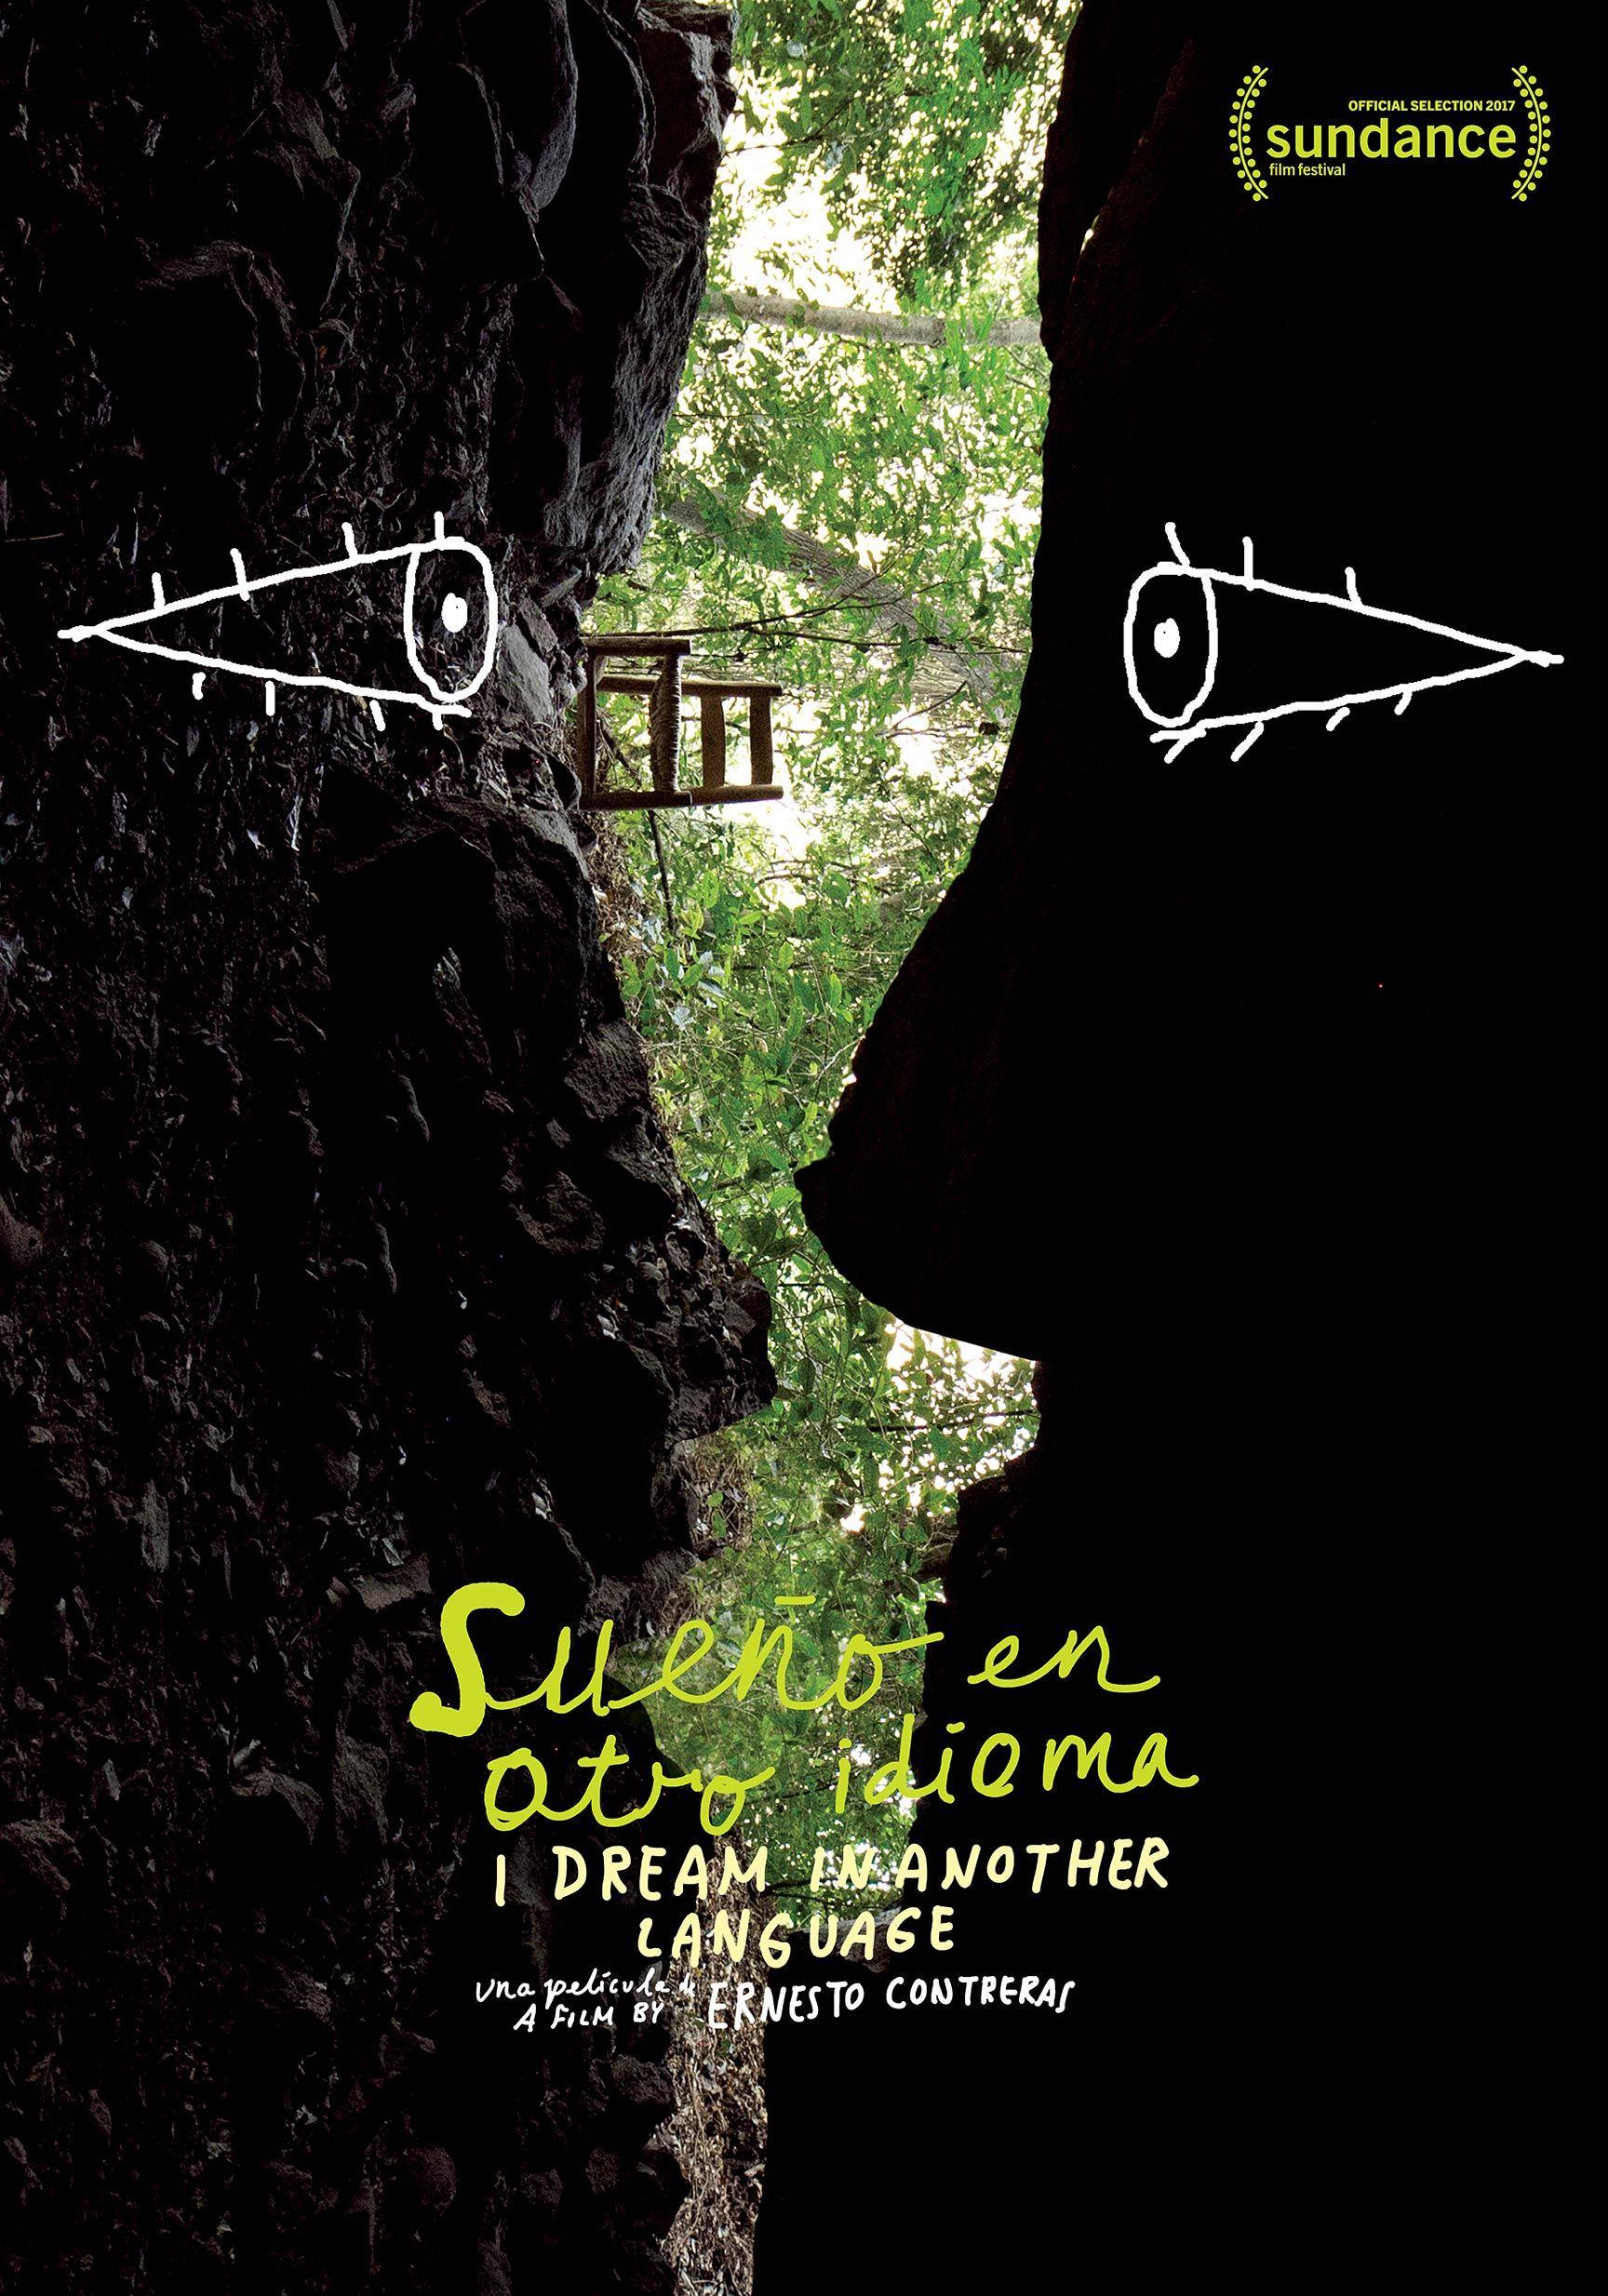 Download Film I Dream In Another Language Sueno En Otro Idioma 2017